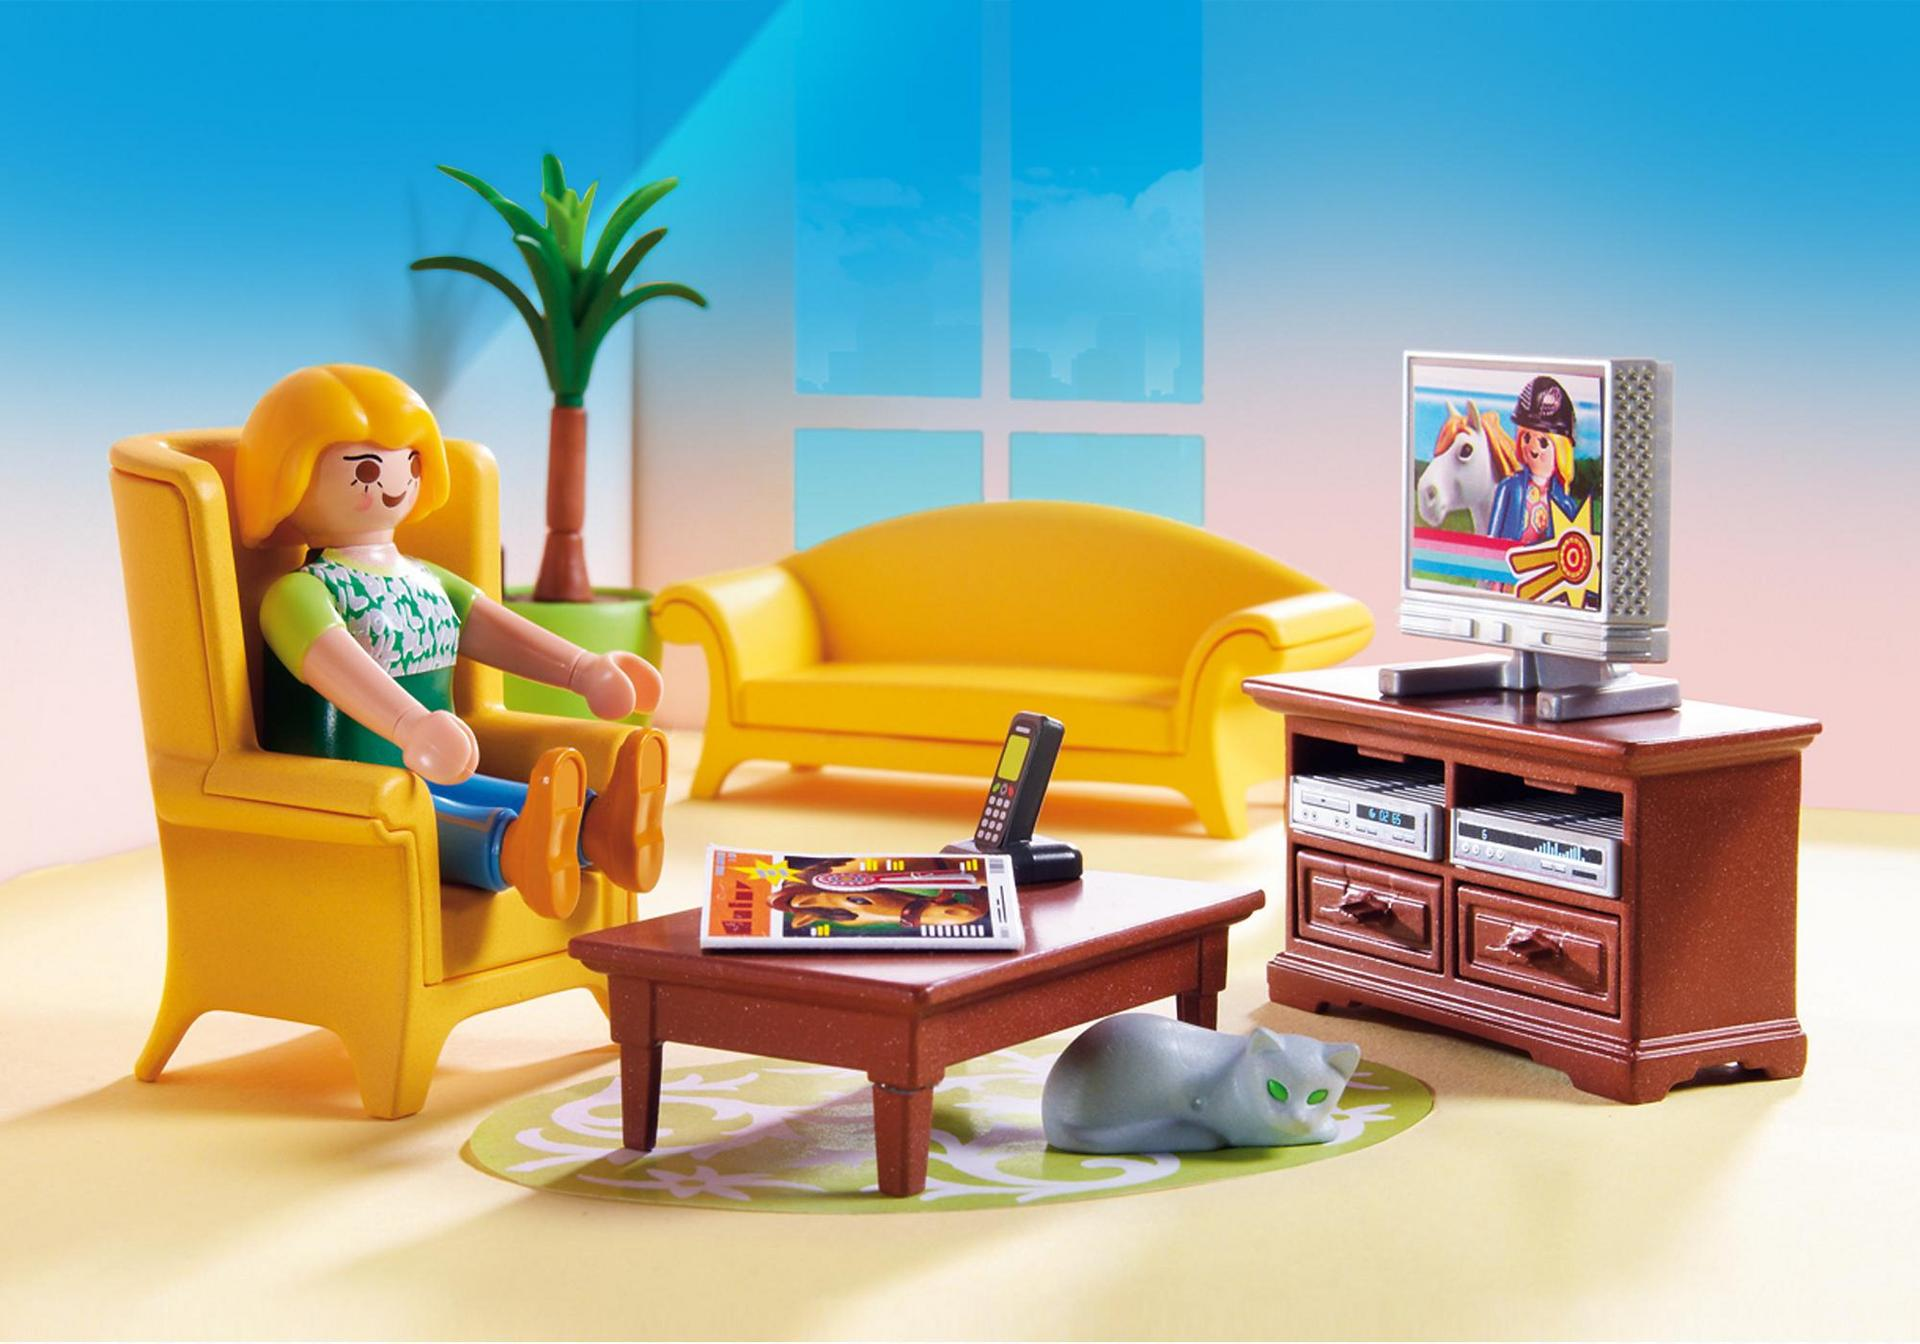 Living Room with Fireplace - 5308 - PLAYMOBIL® USA